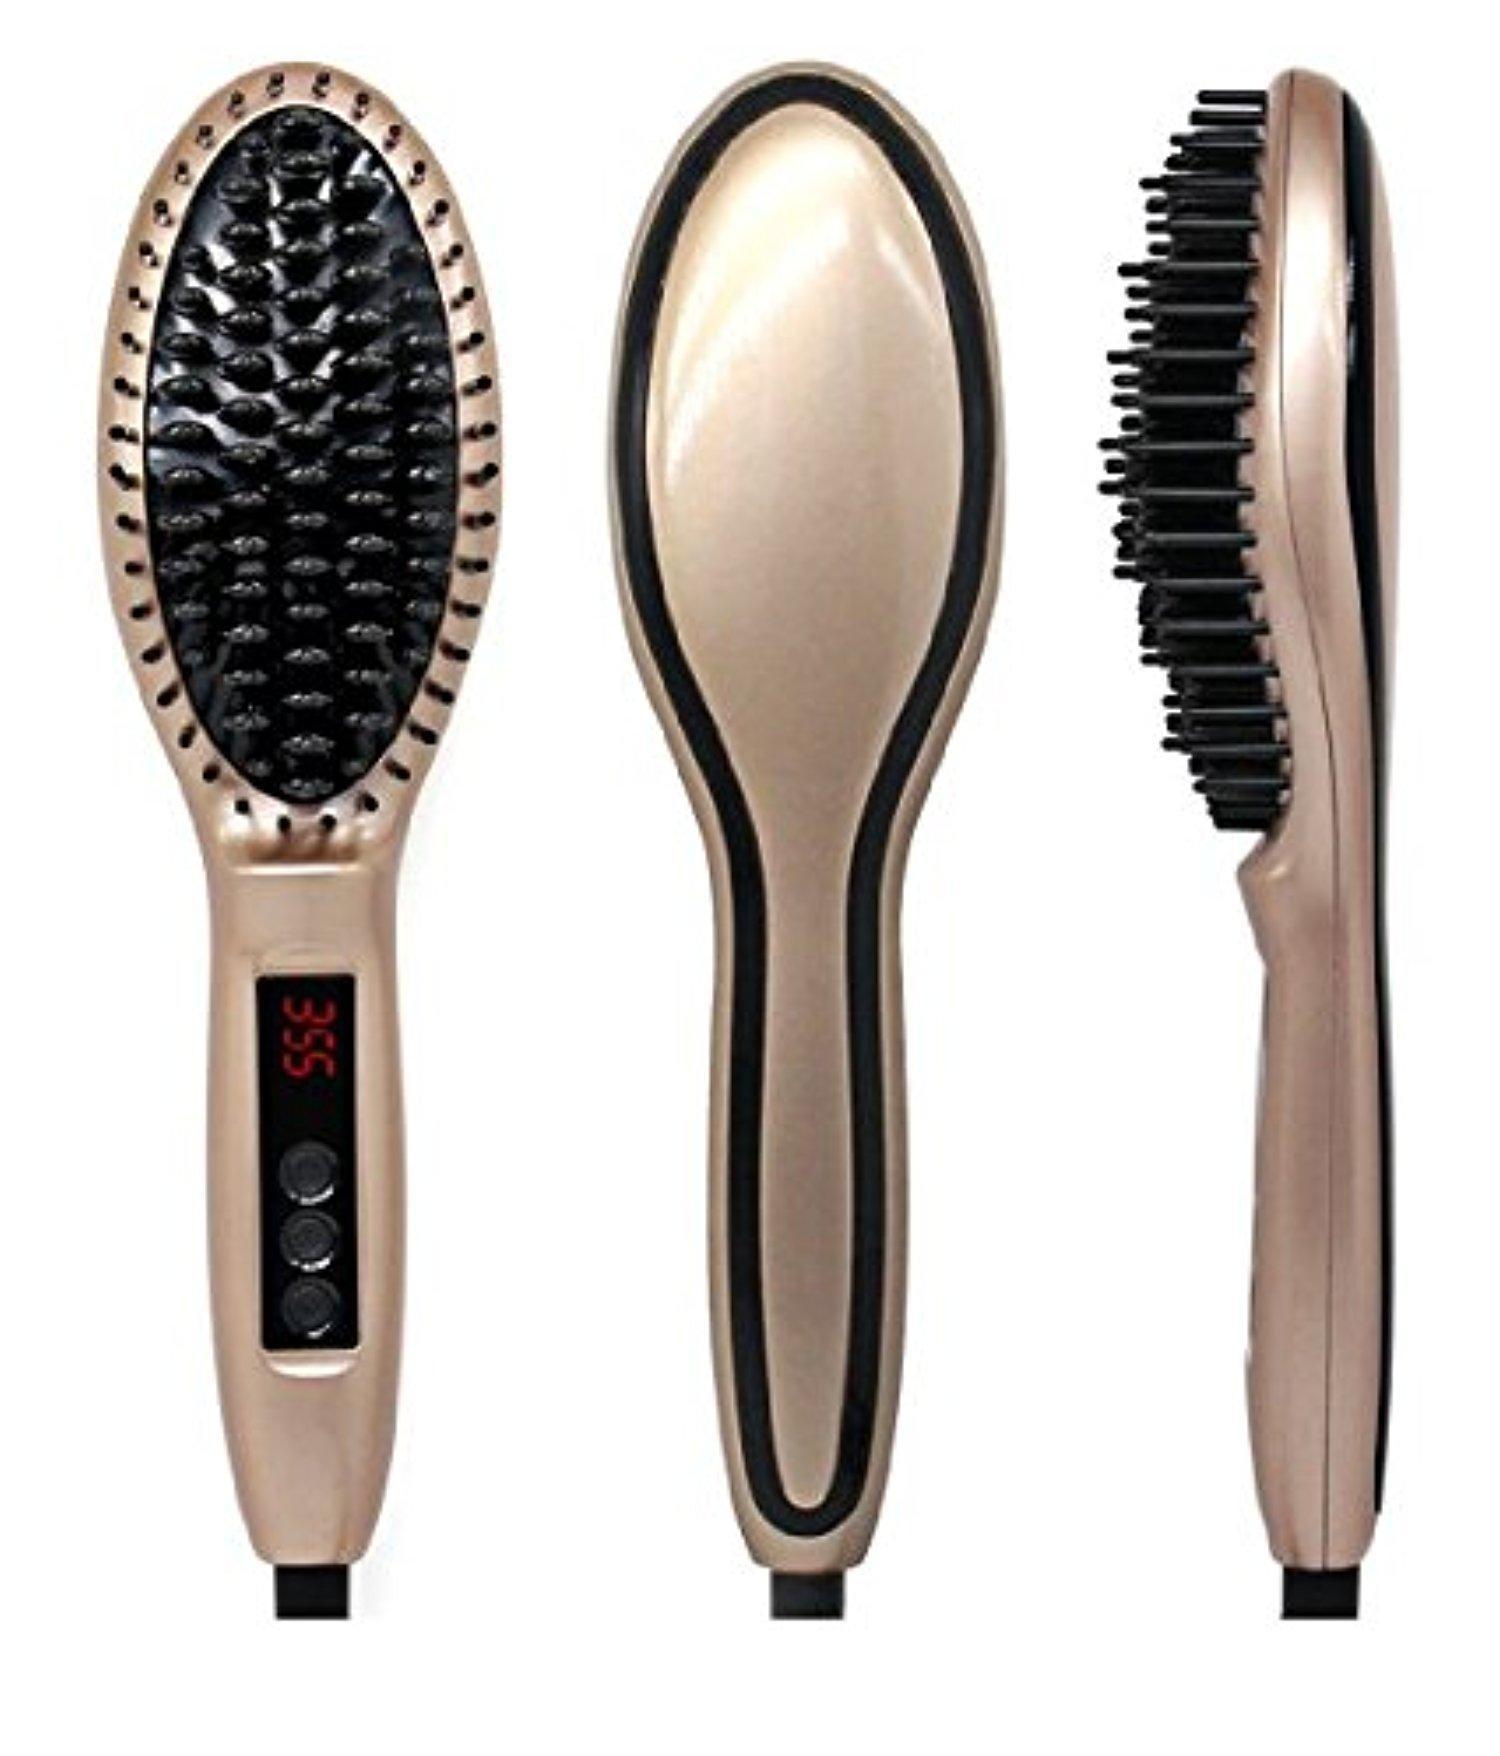 Hair Straightener,Hair Massage Professional Detangling Hair Brush Brush Magic Silky Straight Hair Styling Anion Hair Care Anti Scald Zero Damage